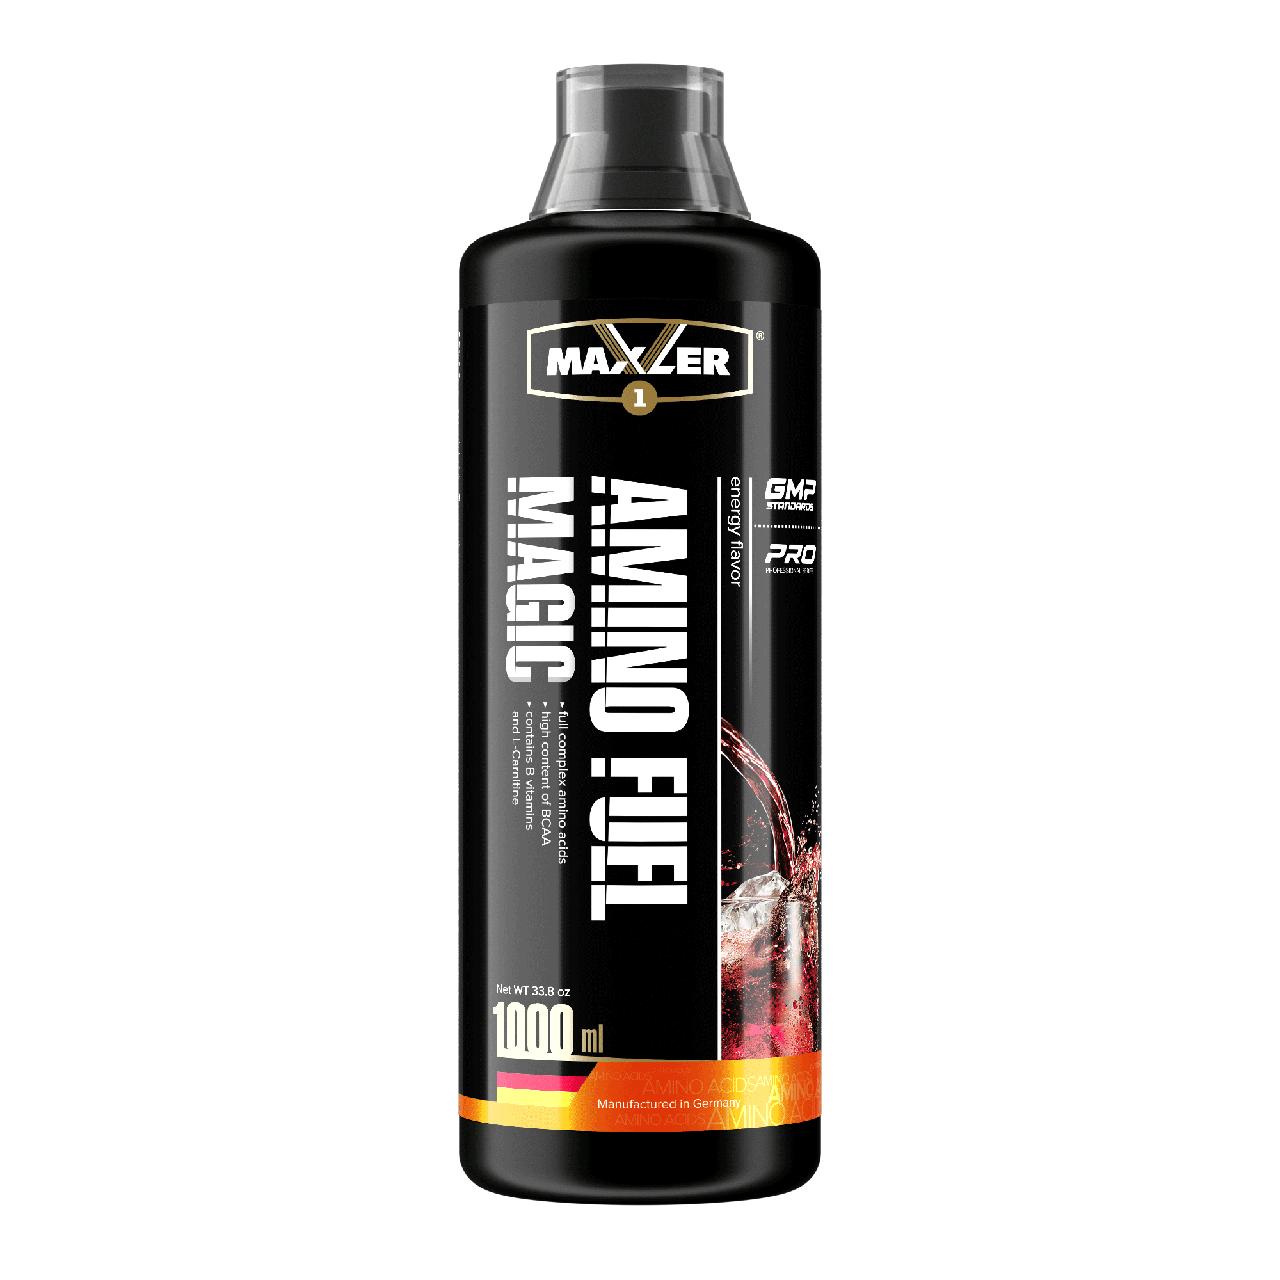 Maxler Amino Magic Fuel 1000 мл – Энерджи